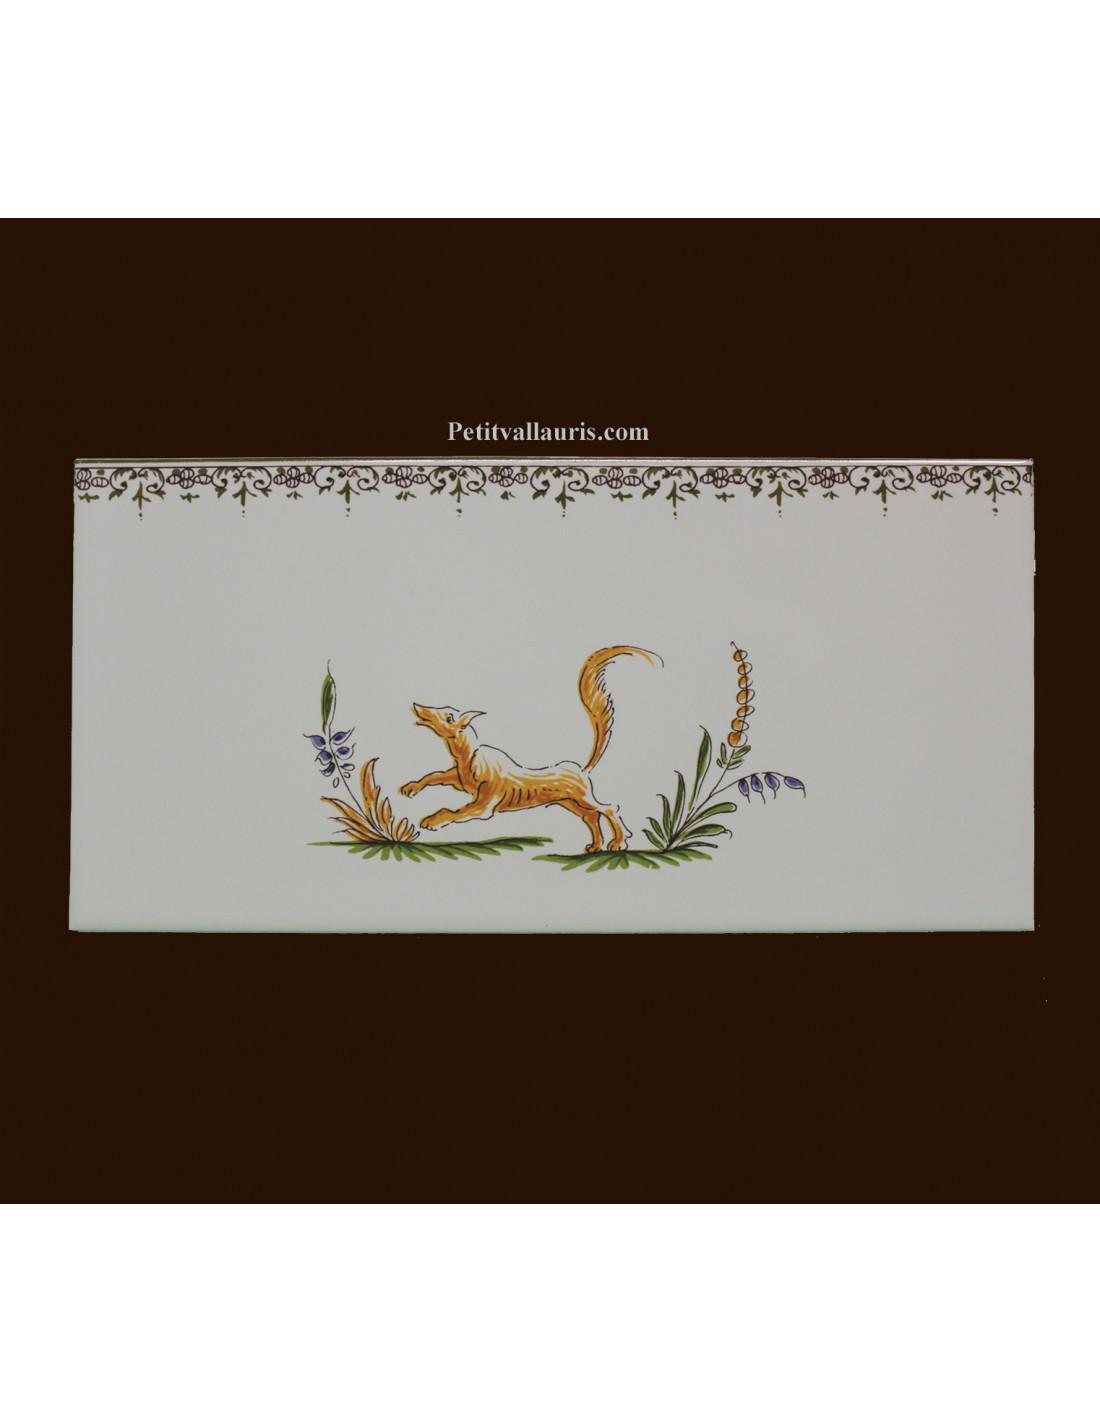 Carrelage 10 x 20 en faience d cor renard r f rence 2219 for Decoration renard